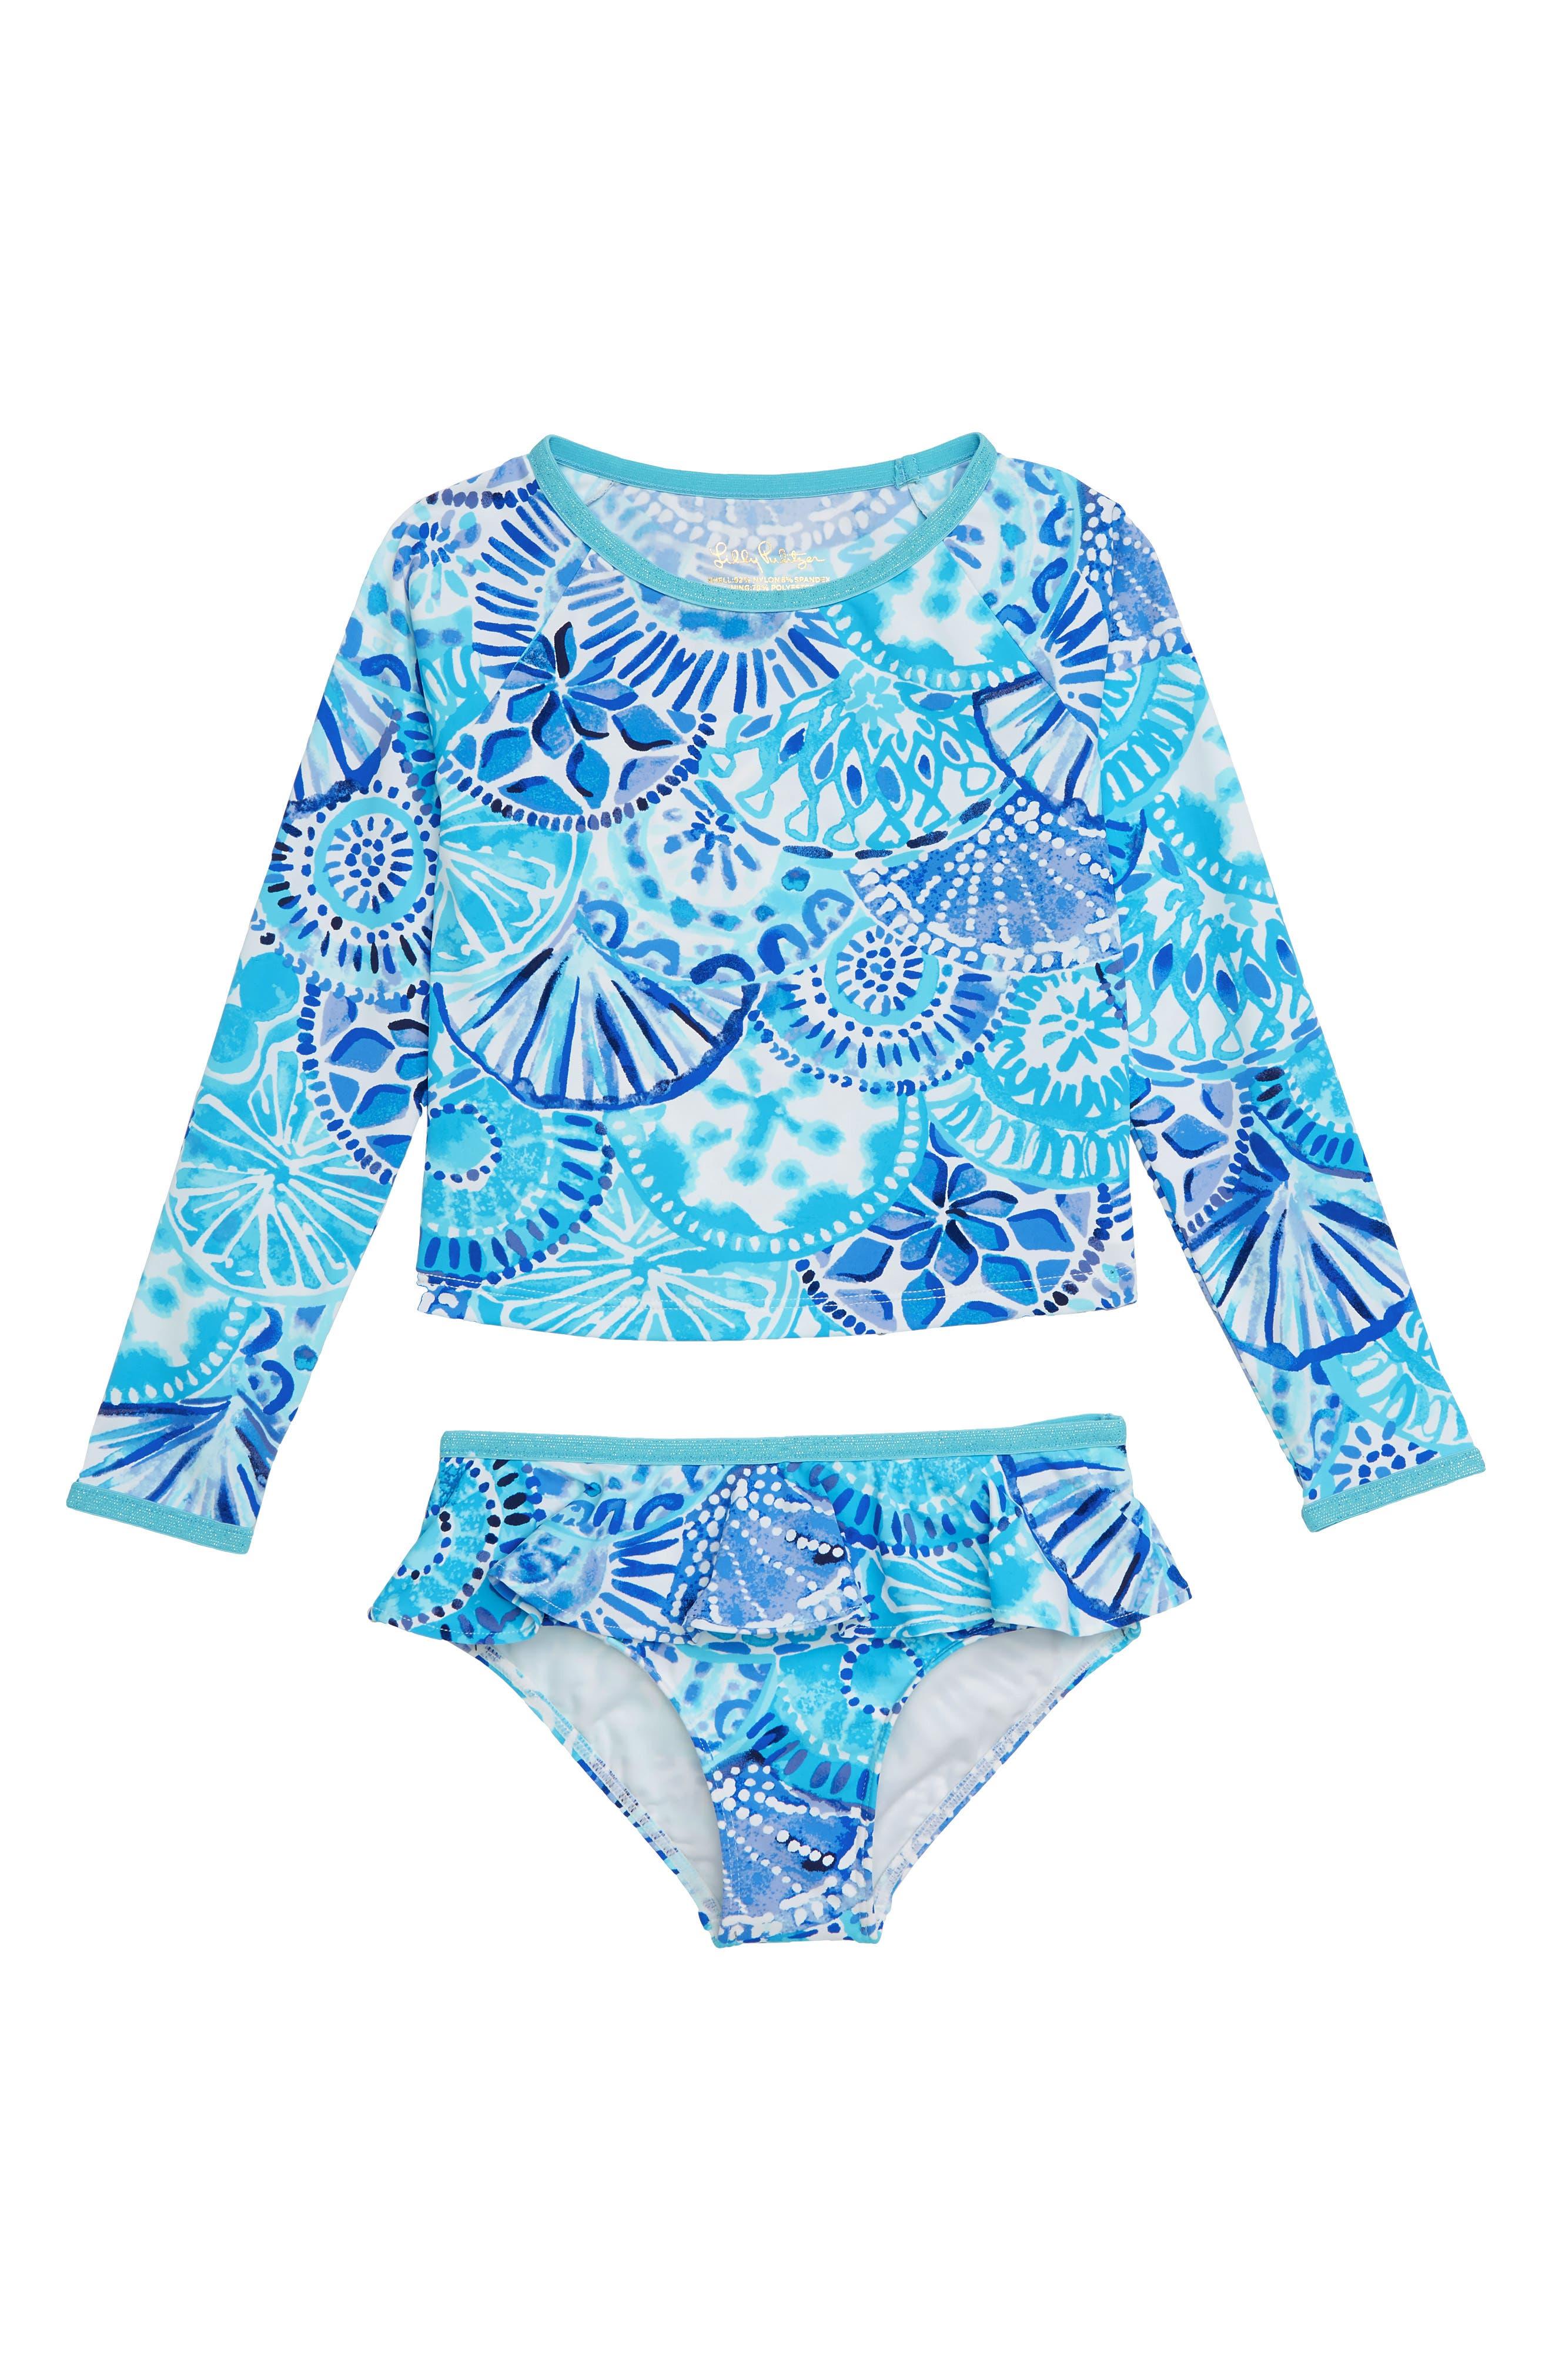 Girls Lilly Pulitzer Cora TwoPiece Rashguard Swimsuit Size 7  Bluegreen